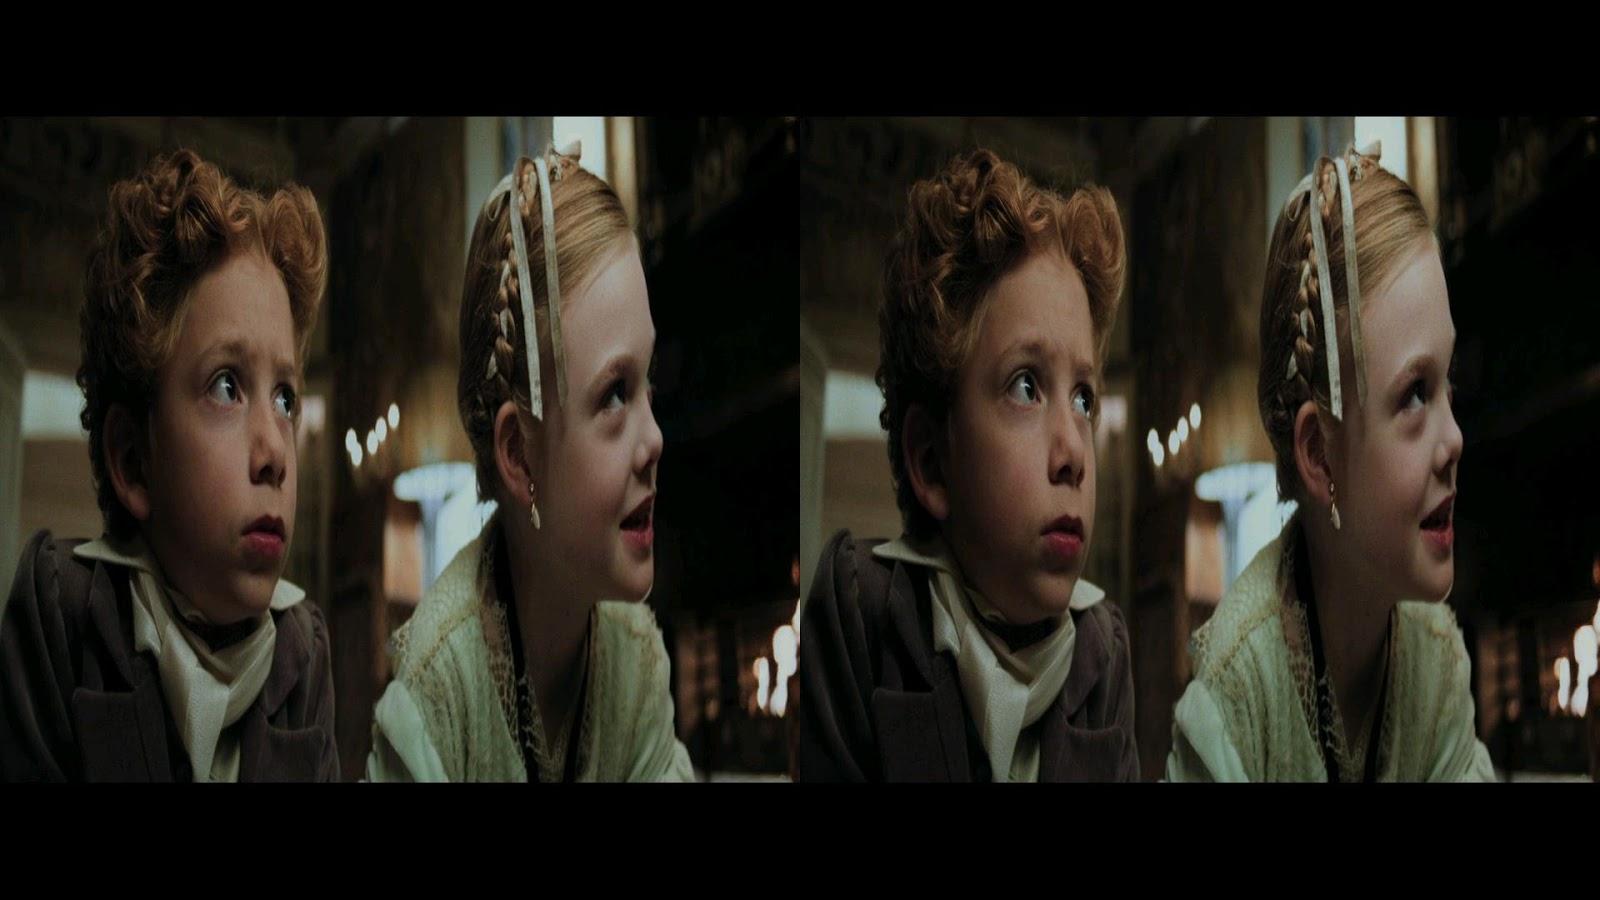 Download - O Quebra-Nozes 3D Half-SBS BluRay 1080p Dual Áudio  Elite